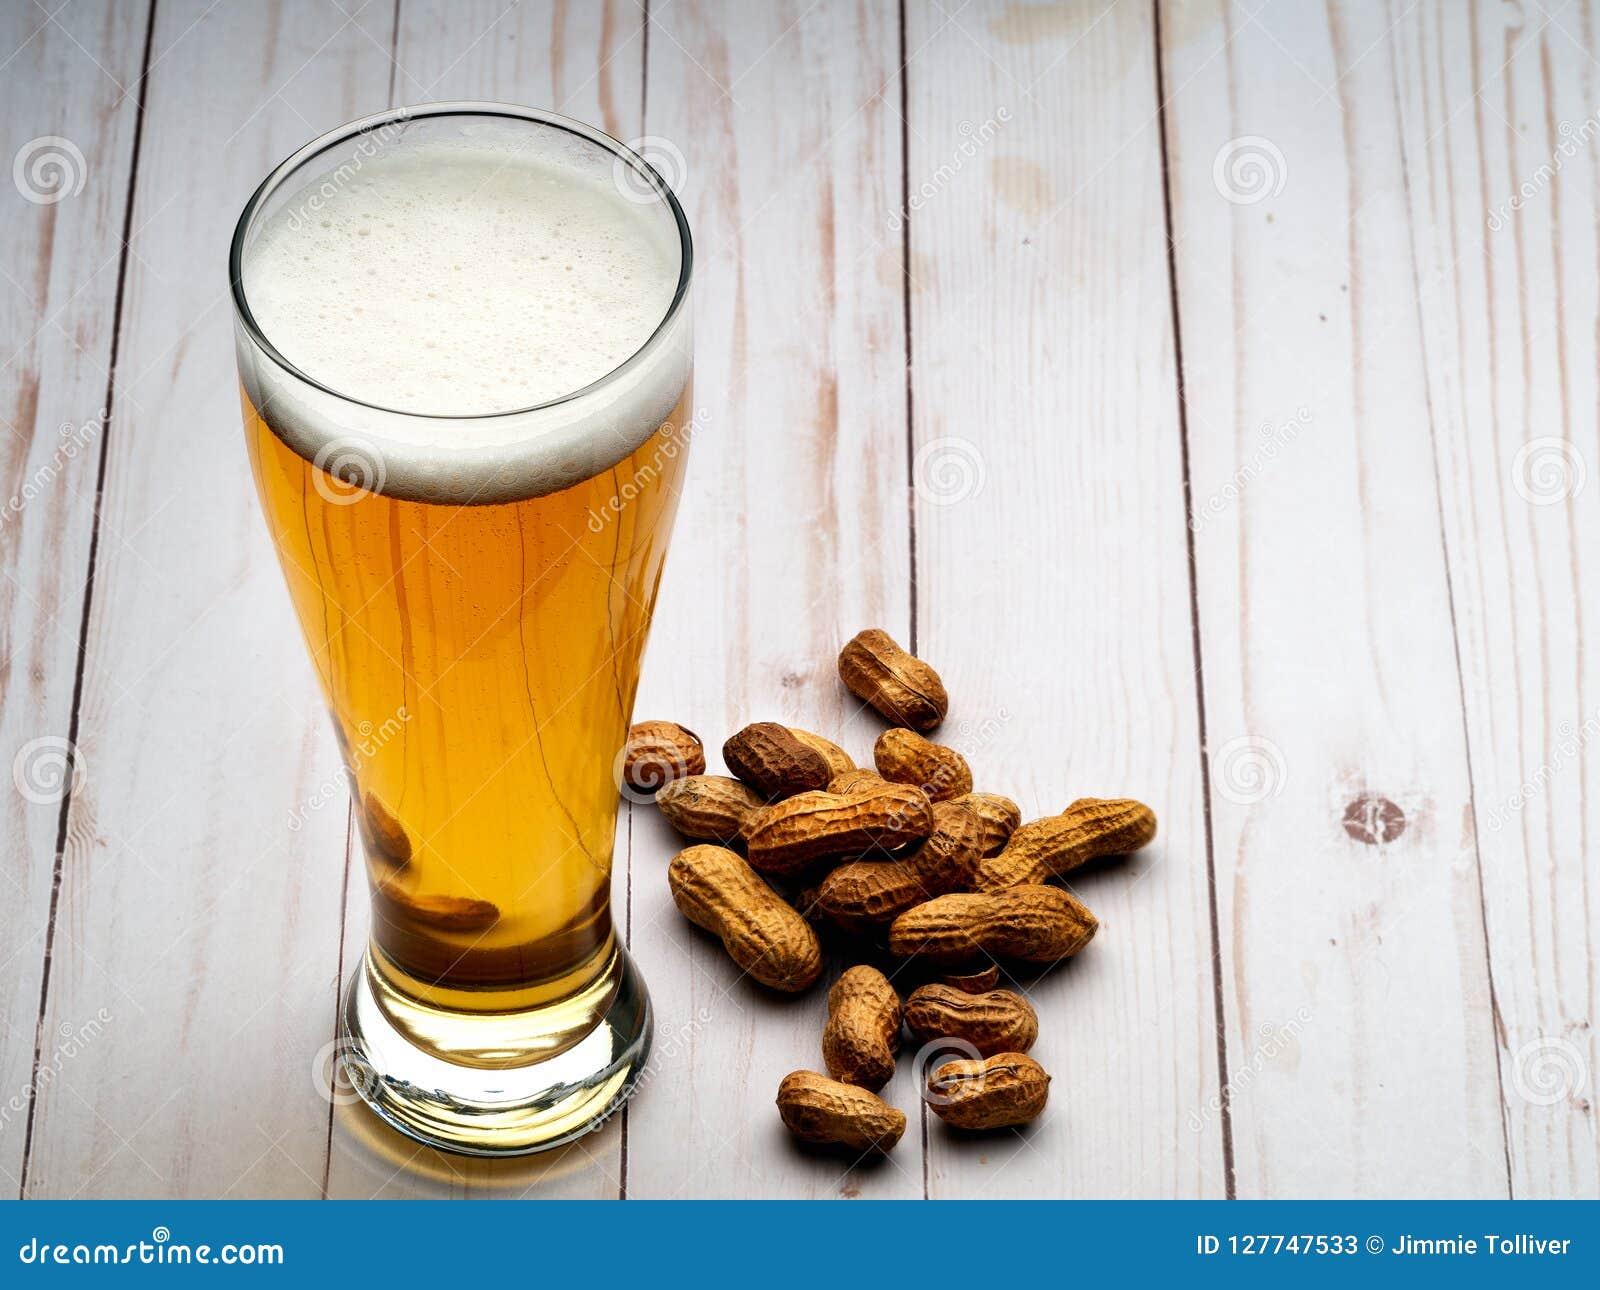 Pilsner beer and peanuts